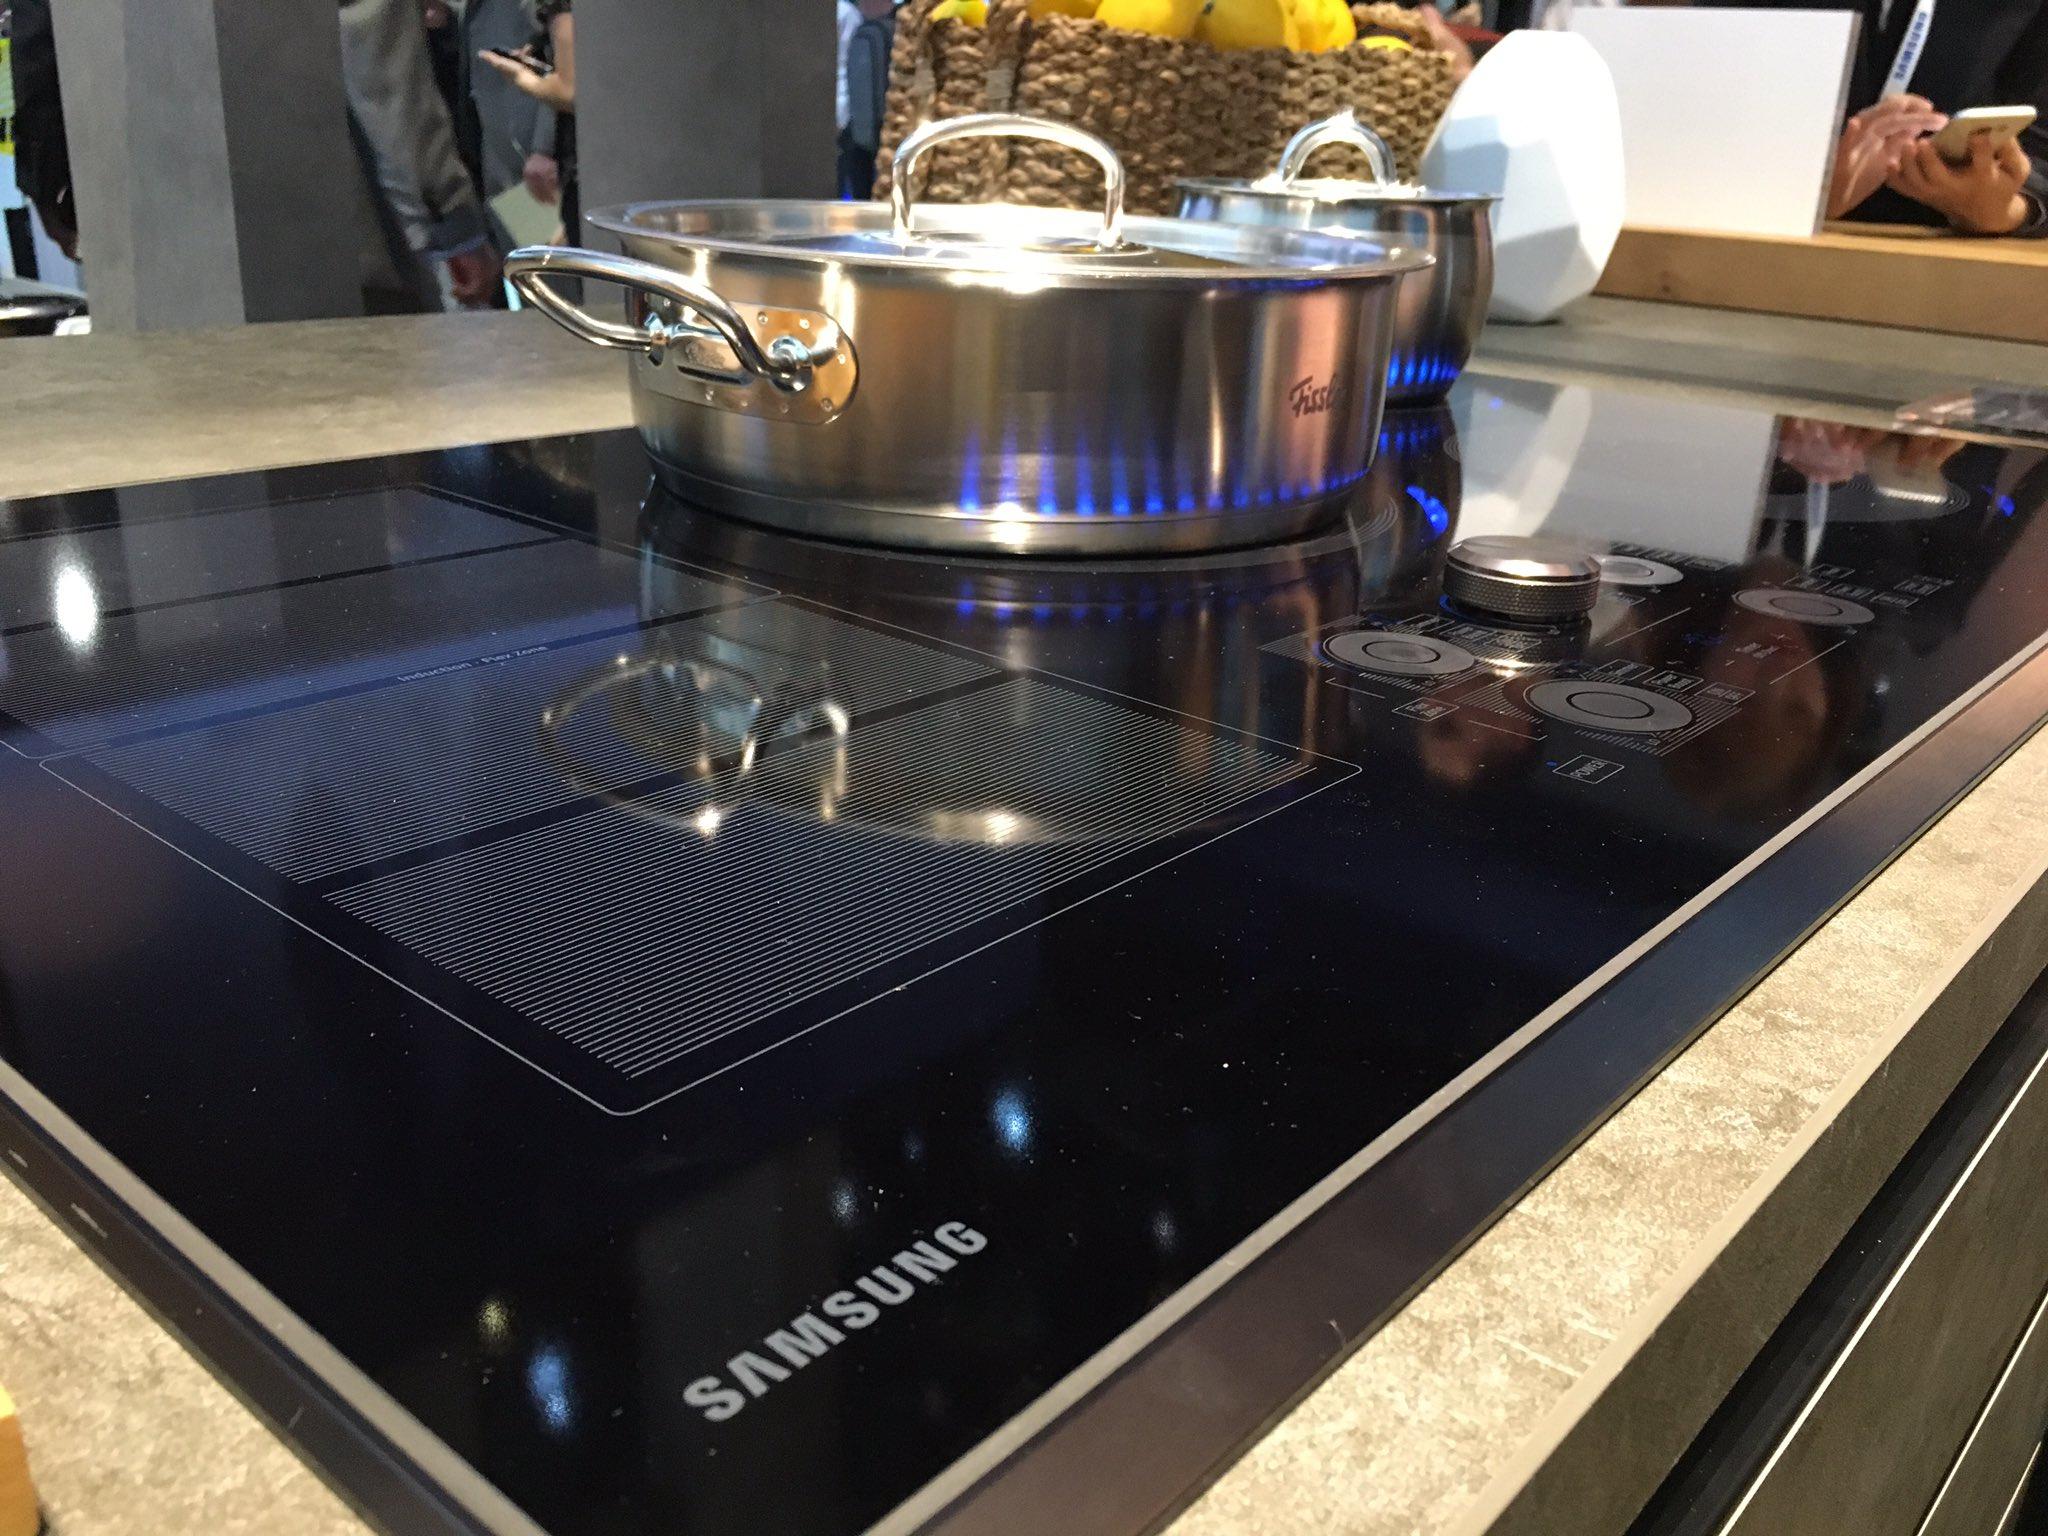 Pc World Kitchen Appliances Currys Pc World On Twitter Samsungs Connected Kitchen